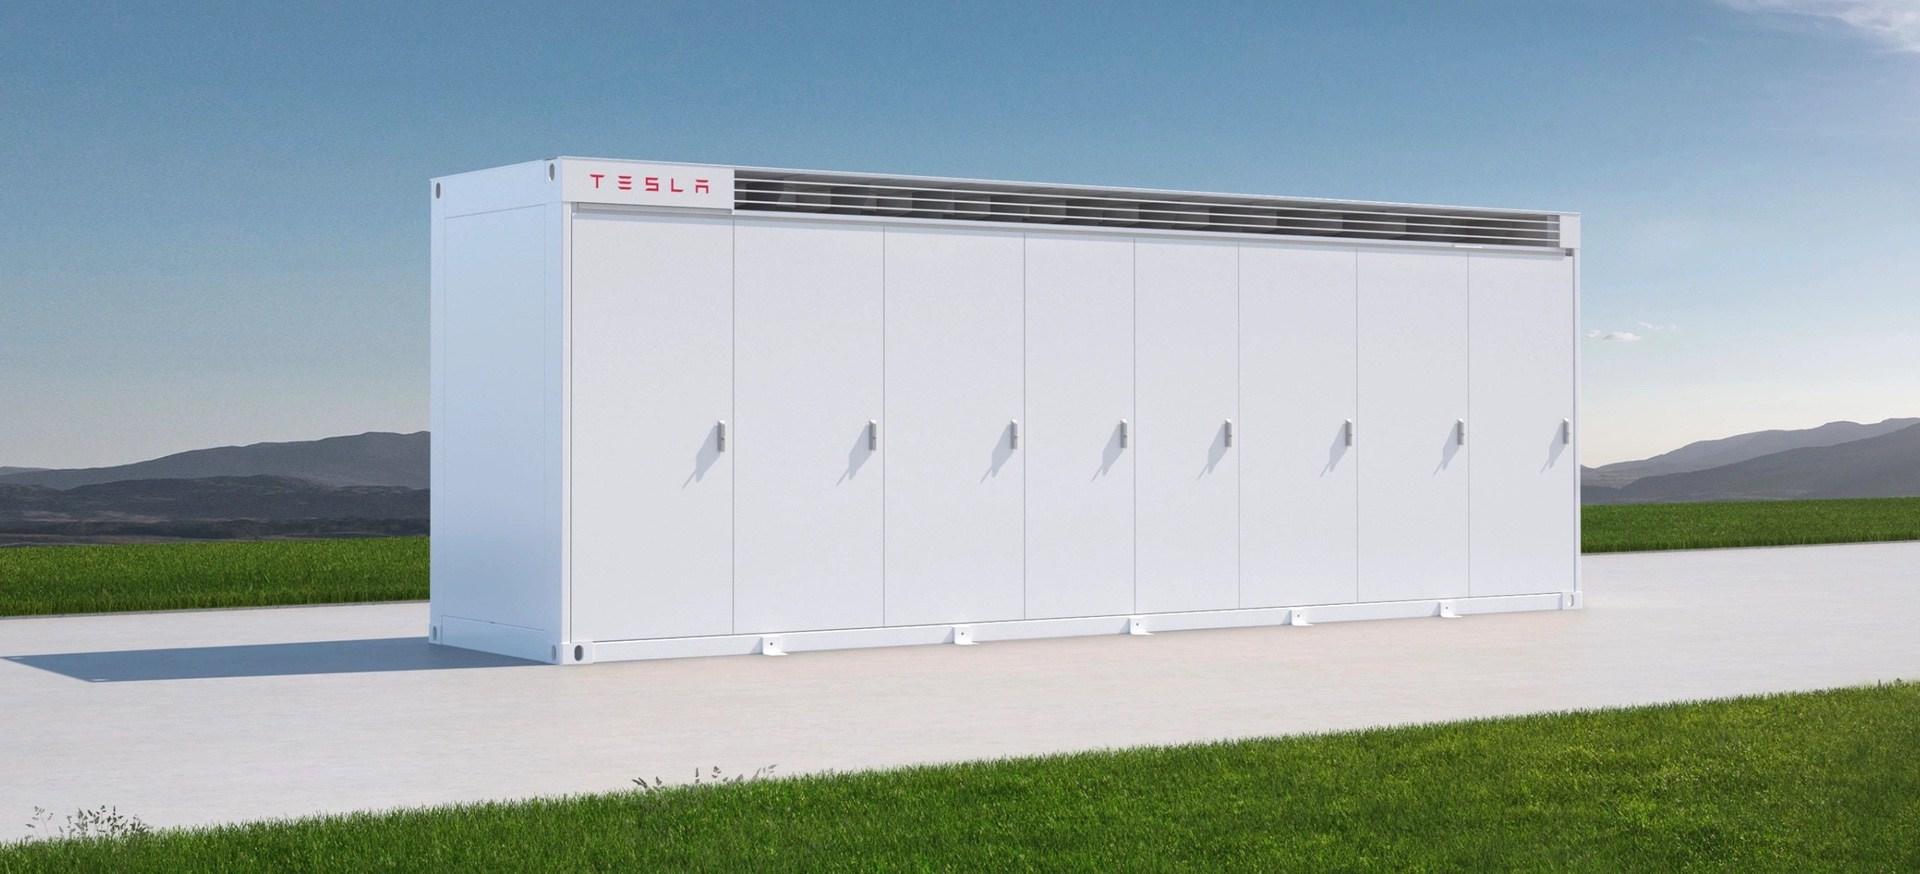 Tesla_Megafactory-0006